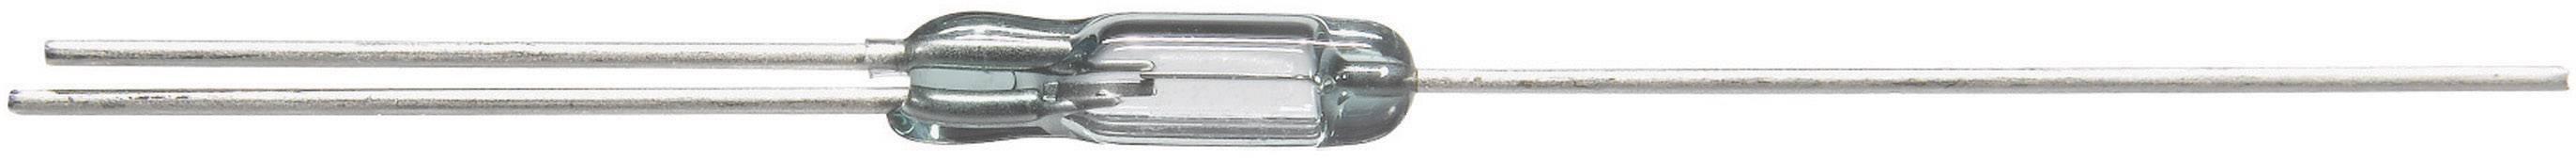 Jazyčkový kontakt PIC HSR-502, 1 prepínací, 30 V/DC, 30 V/AC, 0.1 A, 3 W